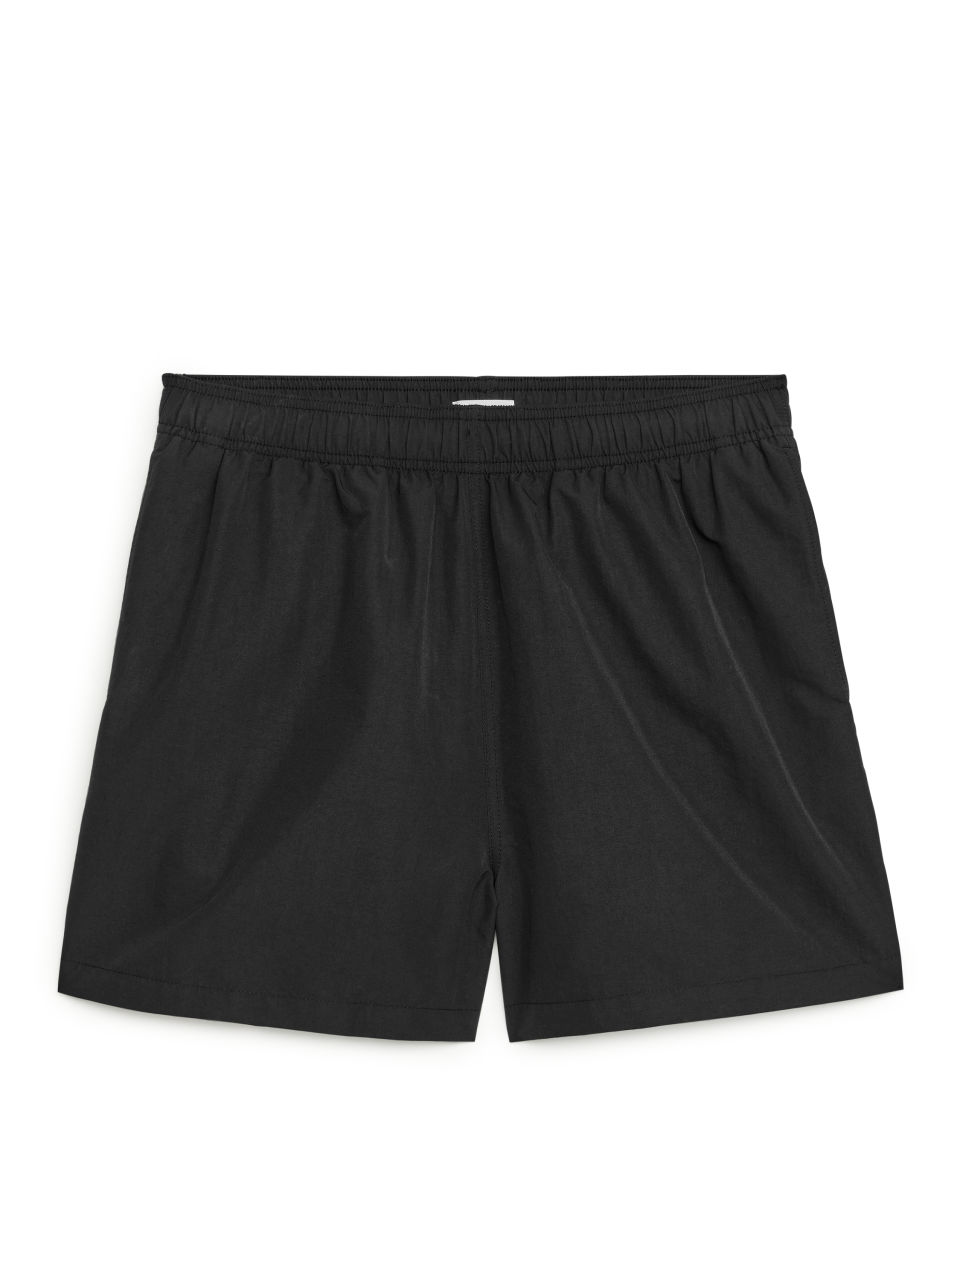 Swim Shorts - Black